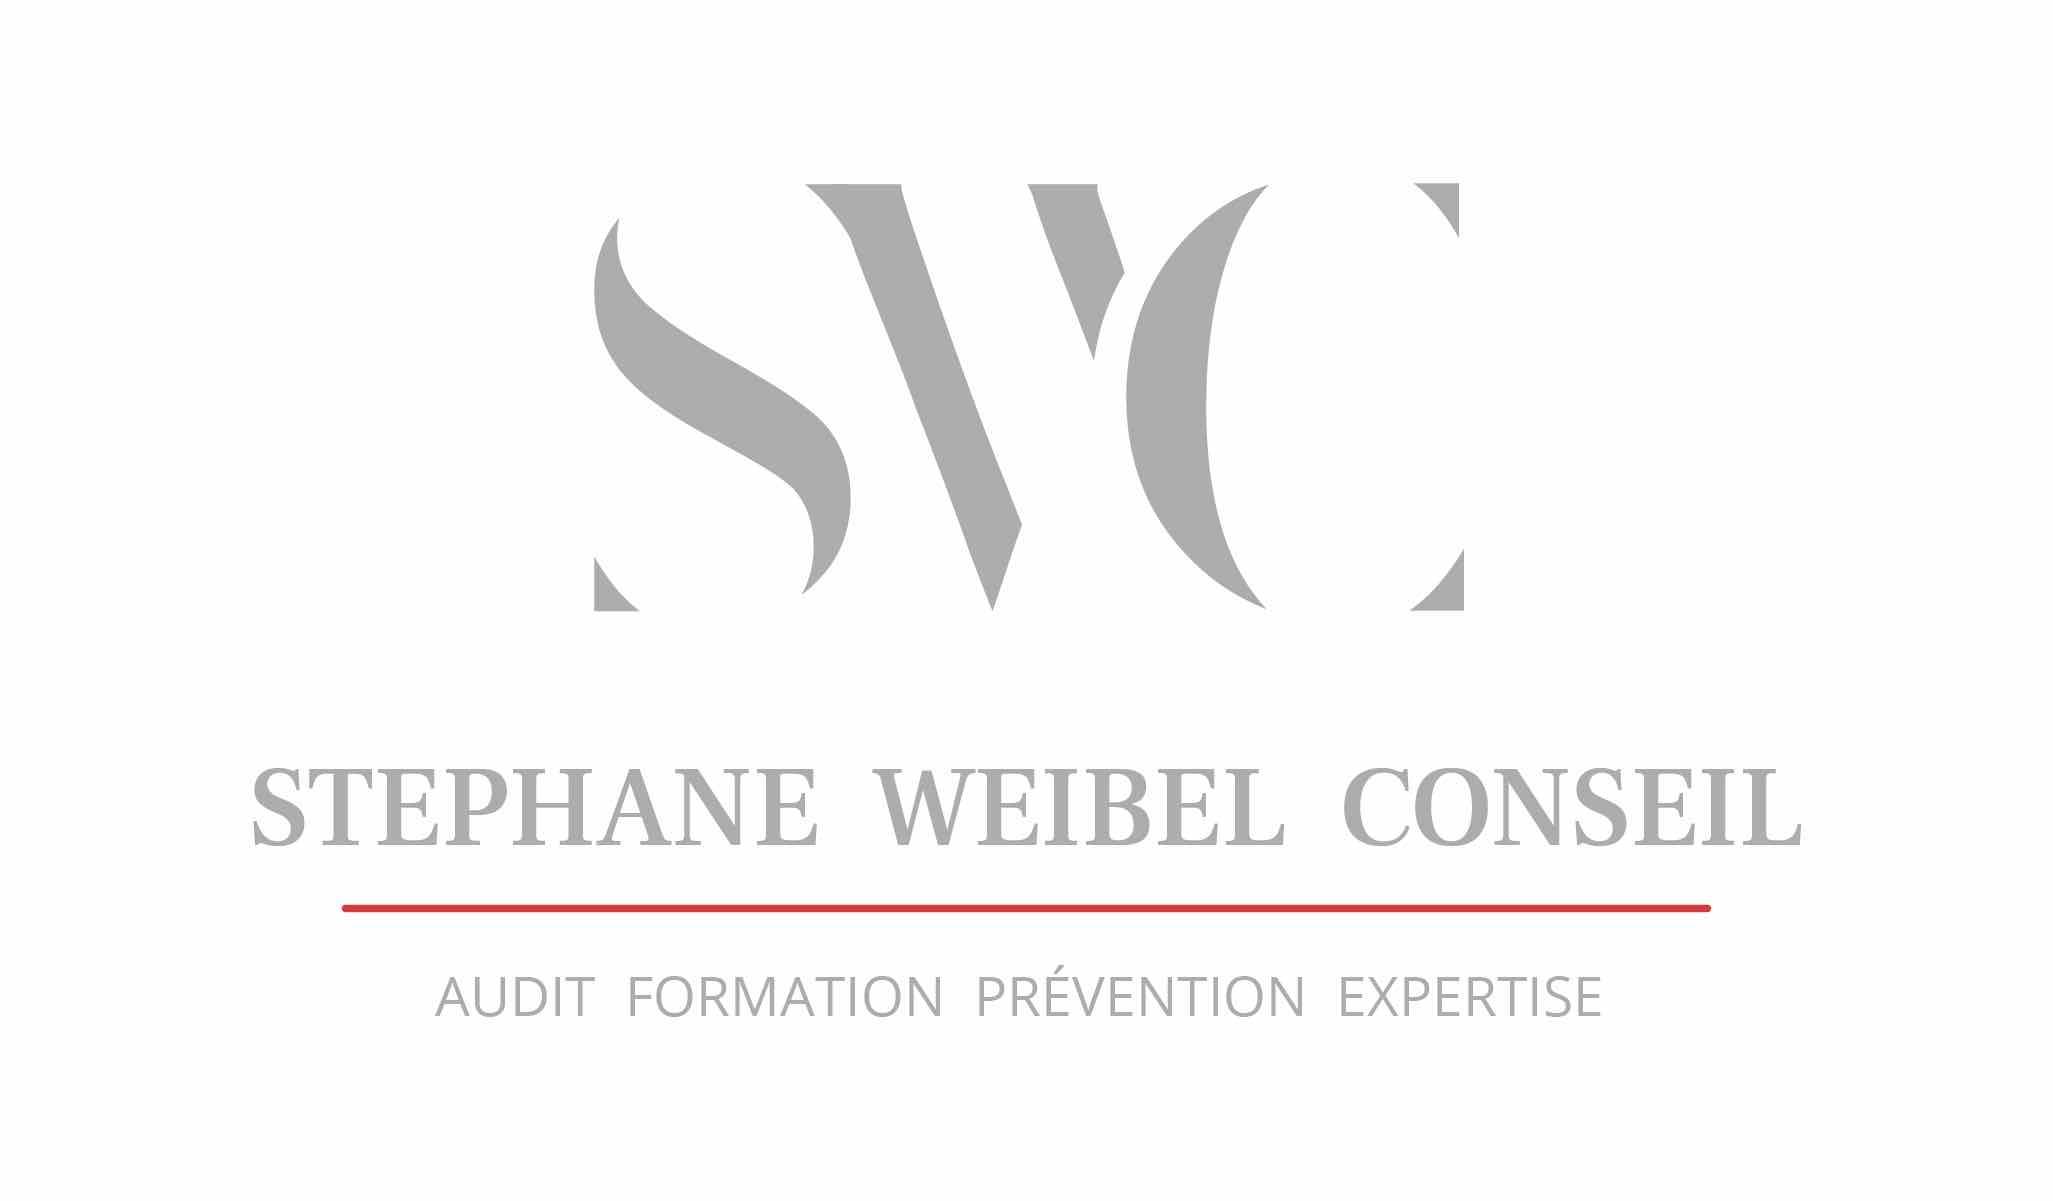 stephane-weibel-conseil